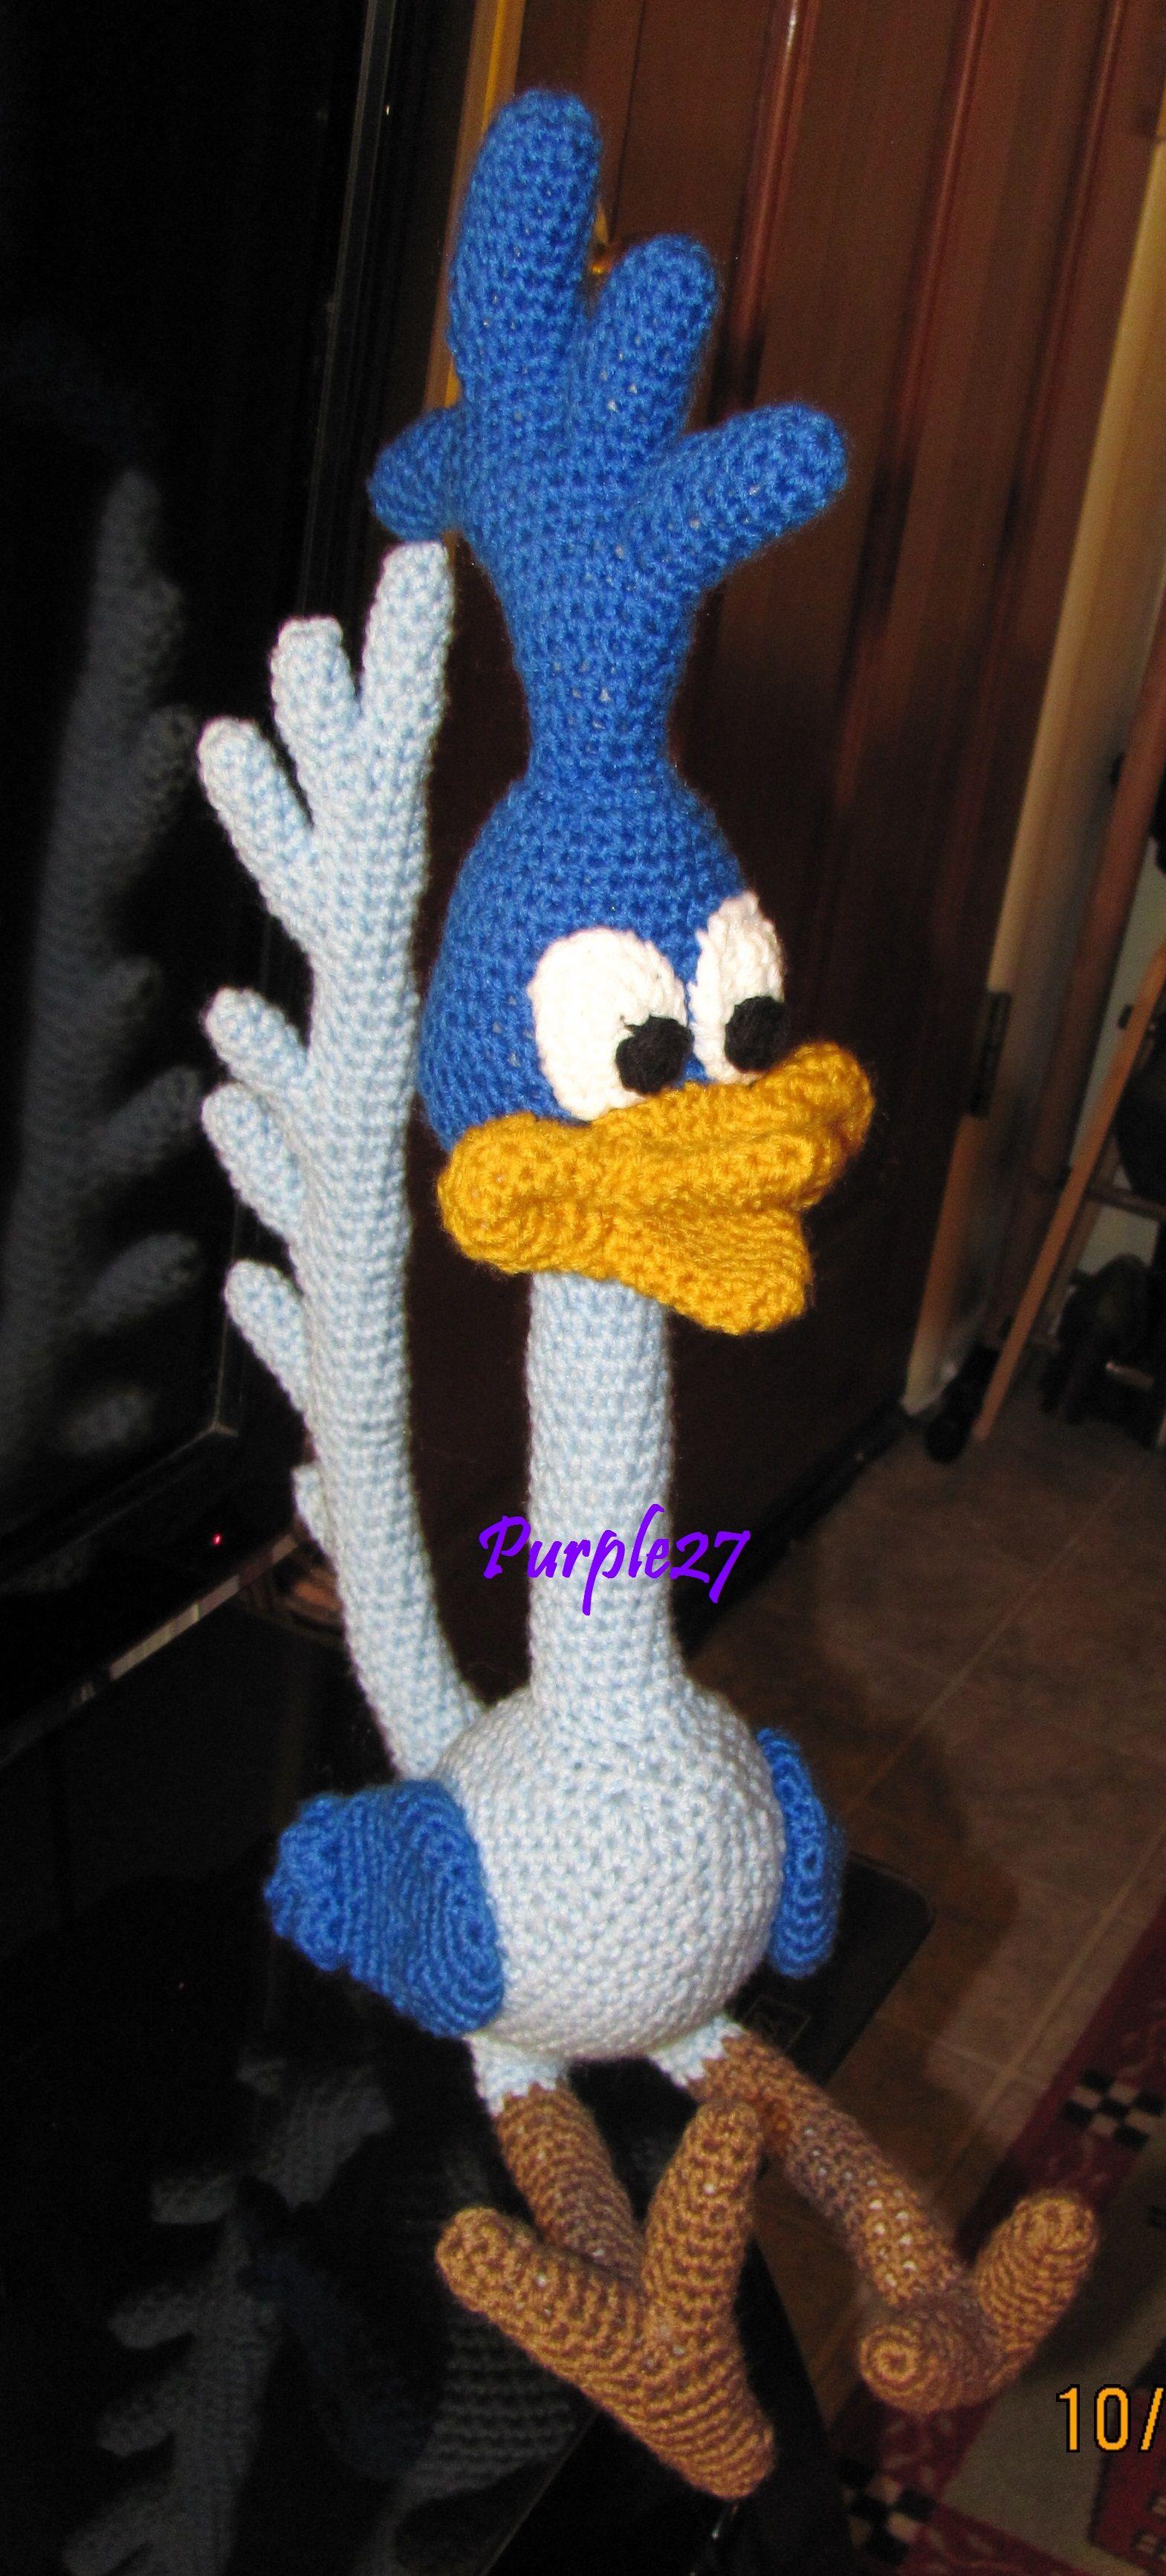 Crochet Roadrunner Pattern Pdf Instant Download 4